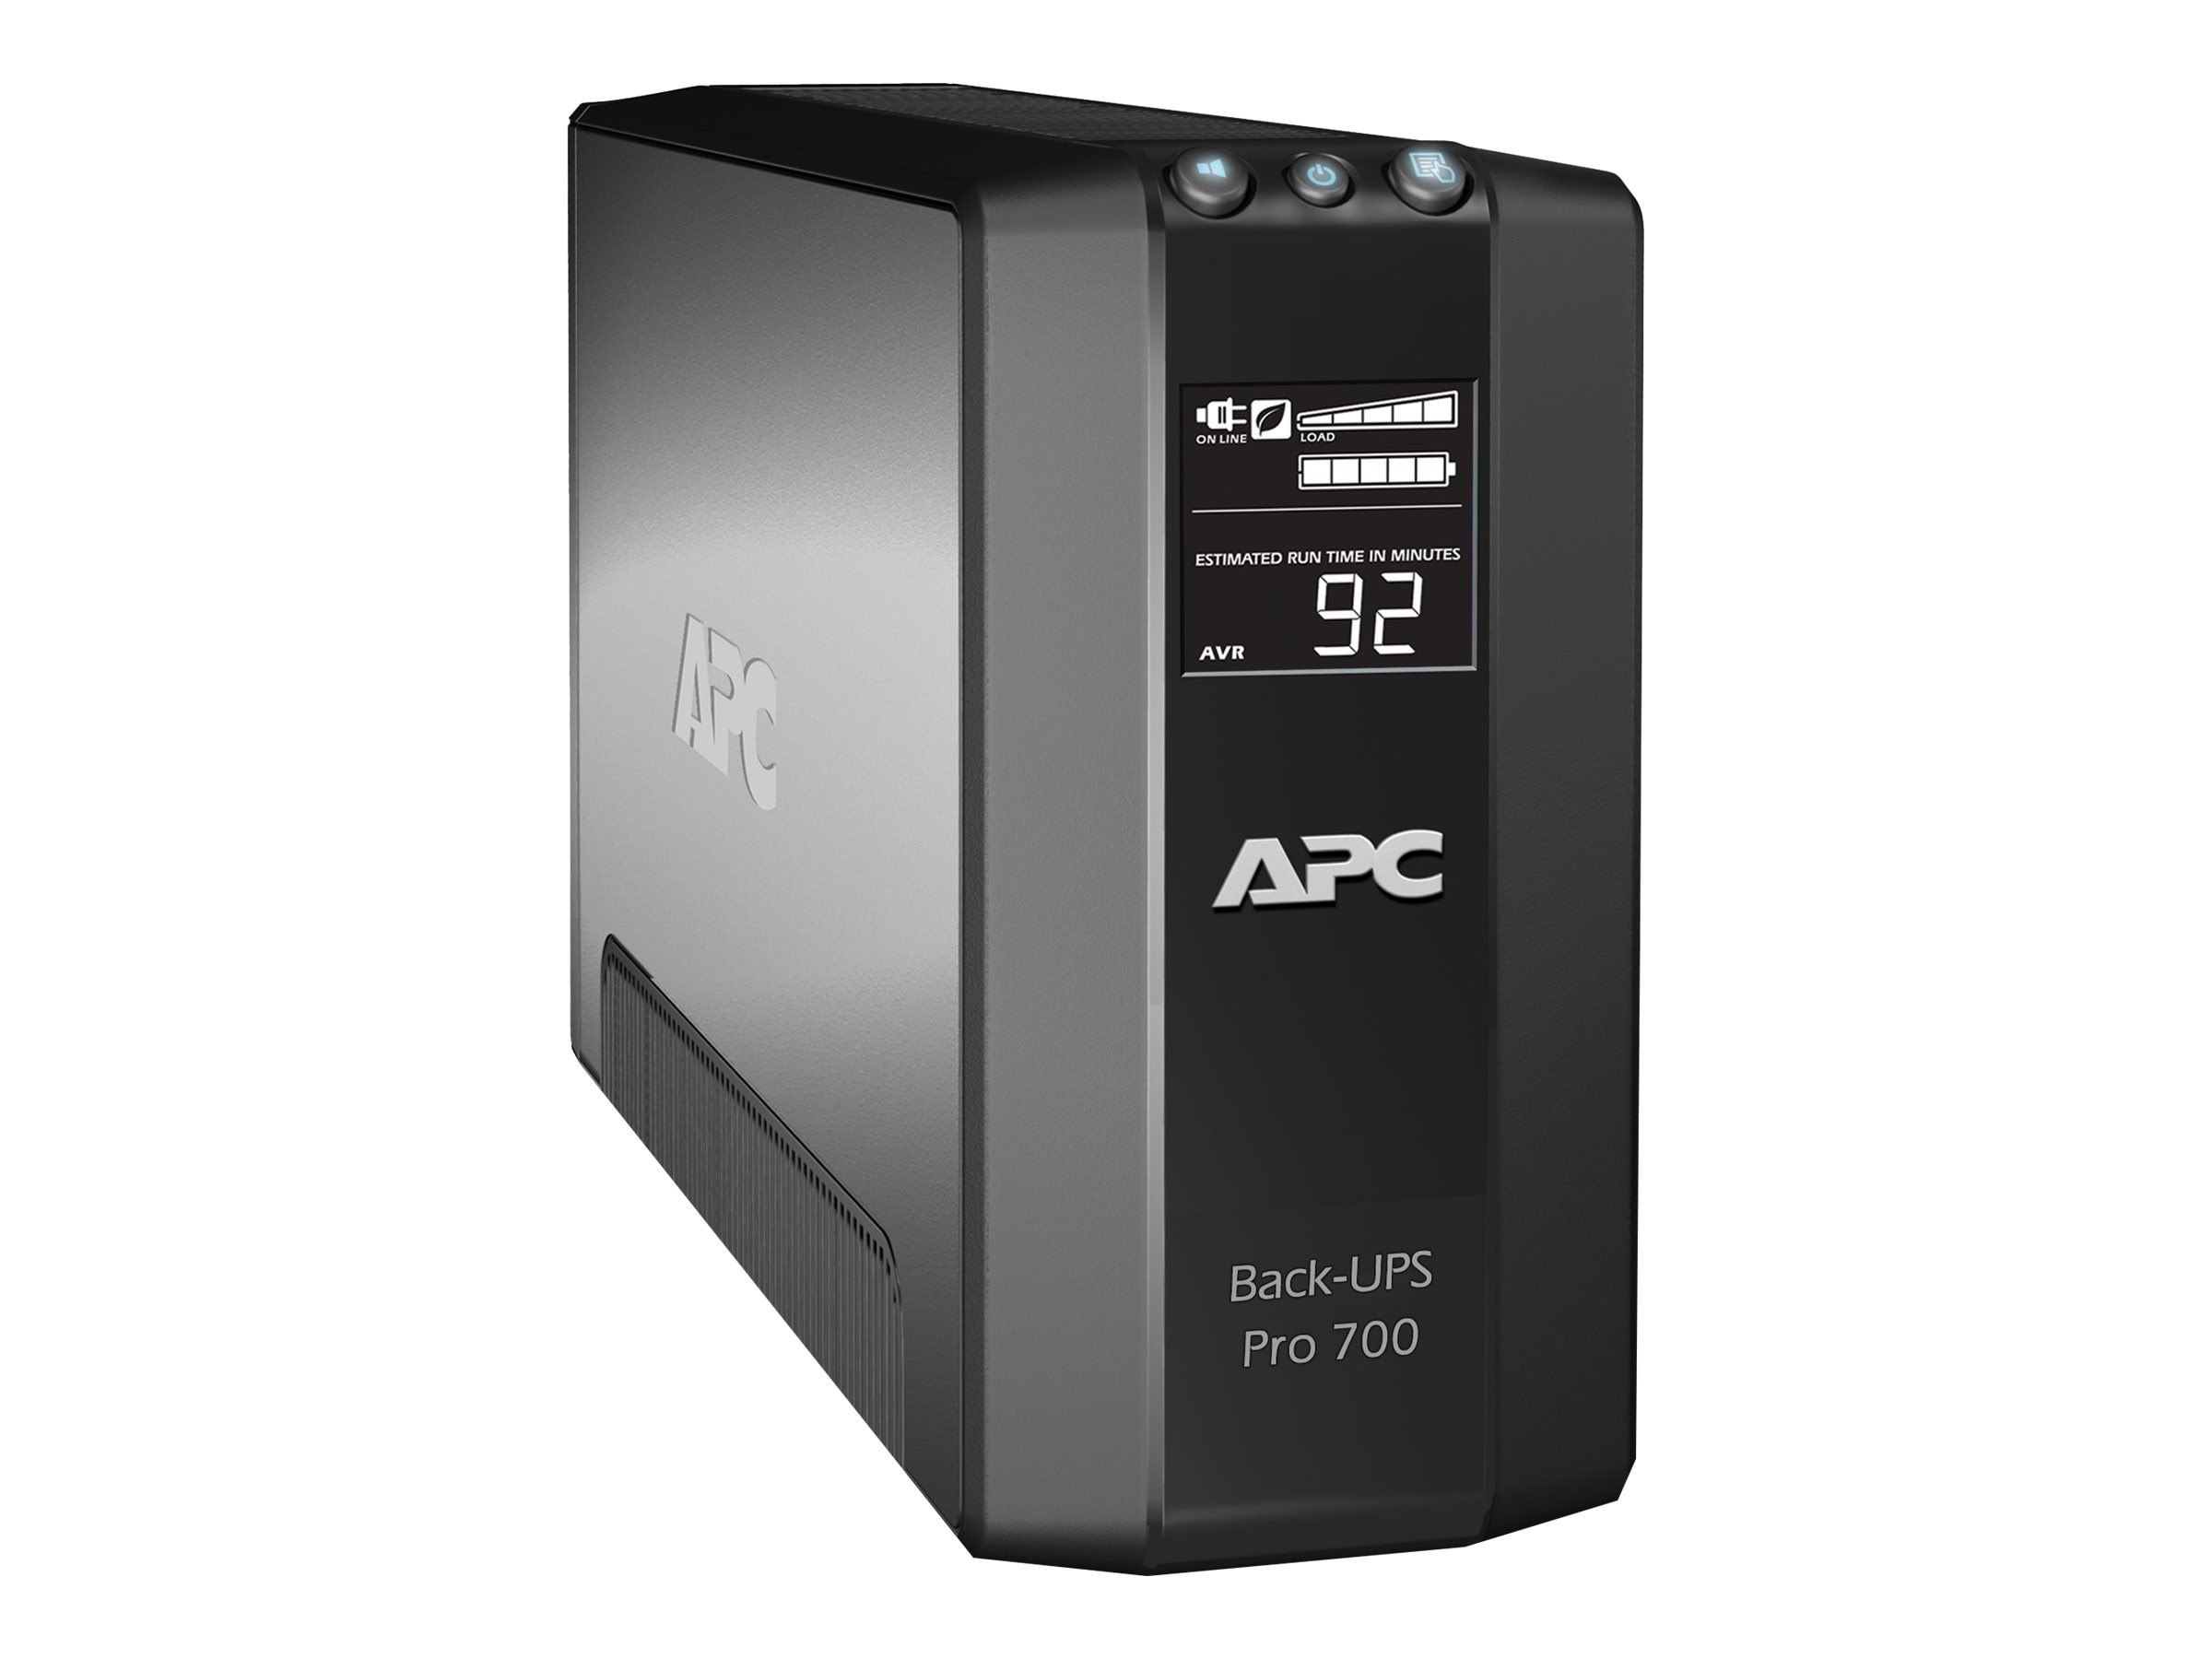 Apc Power Saving Back Ups Pro 700va 420w 120v 5 15p Input 6 Circuit Diagram Of Numeric Br700g